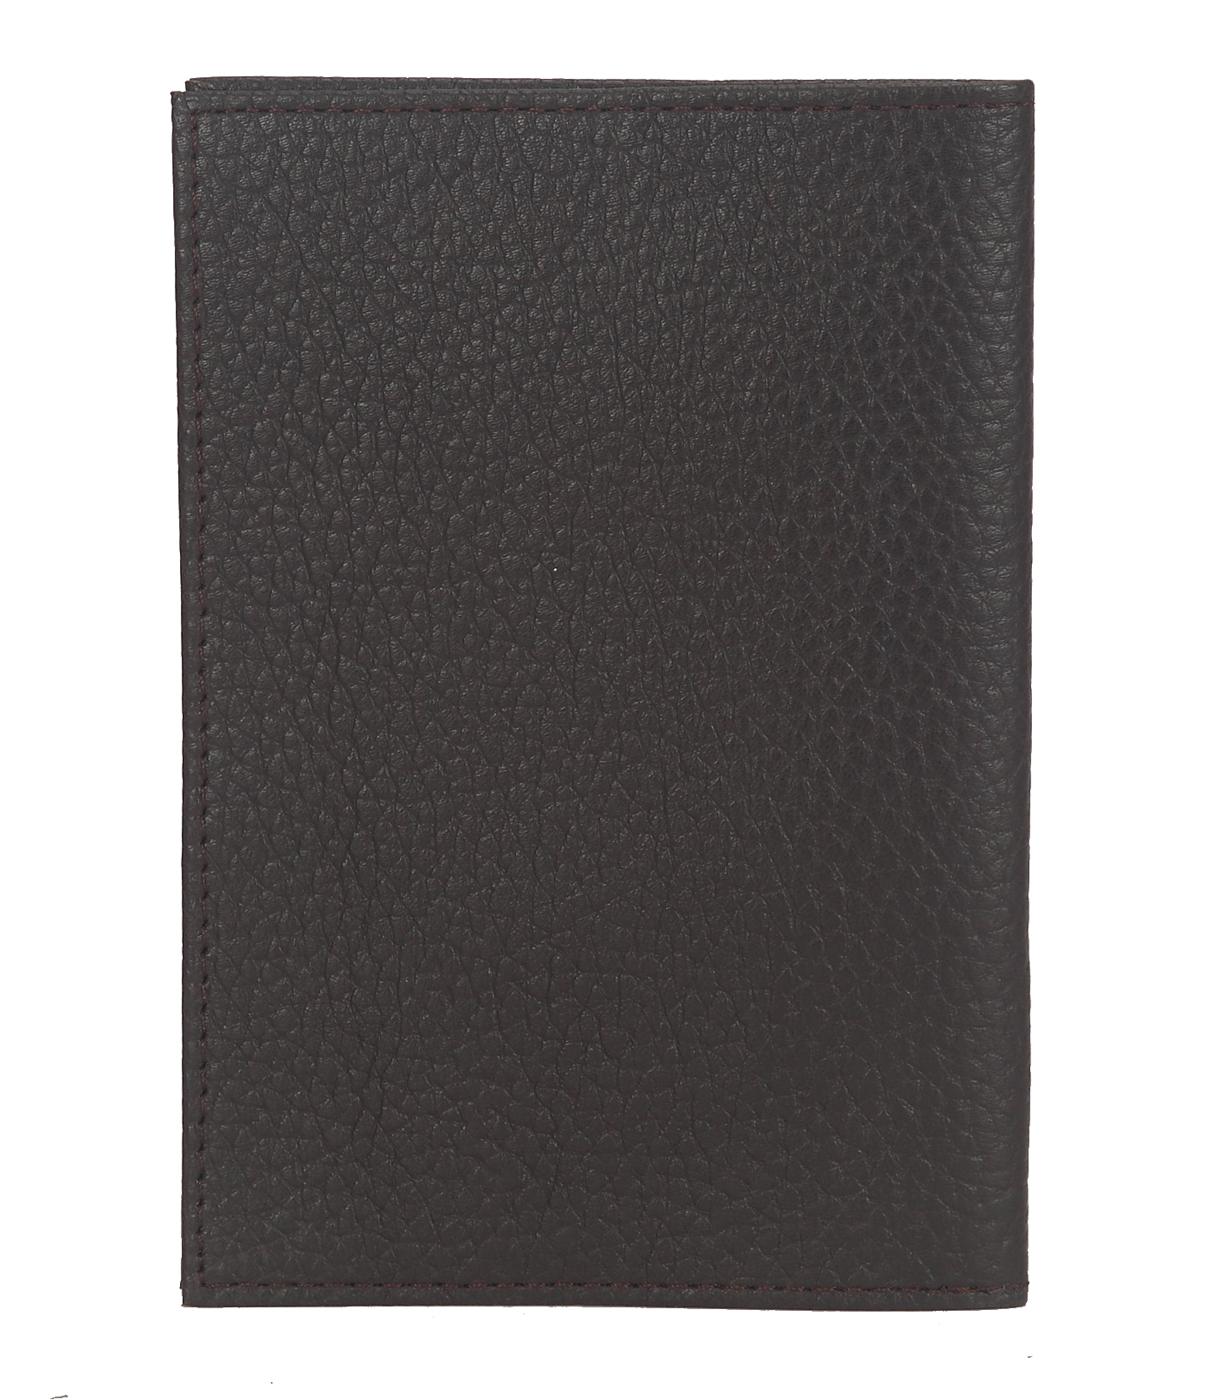 W251--Passport cover in Genuine Leather - Black